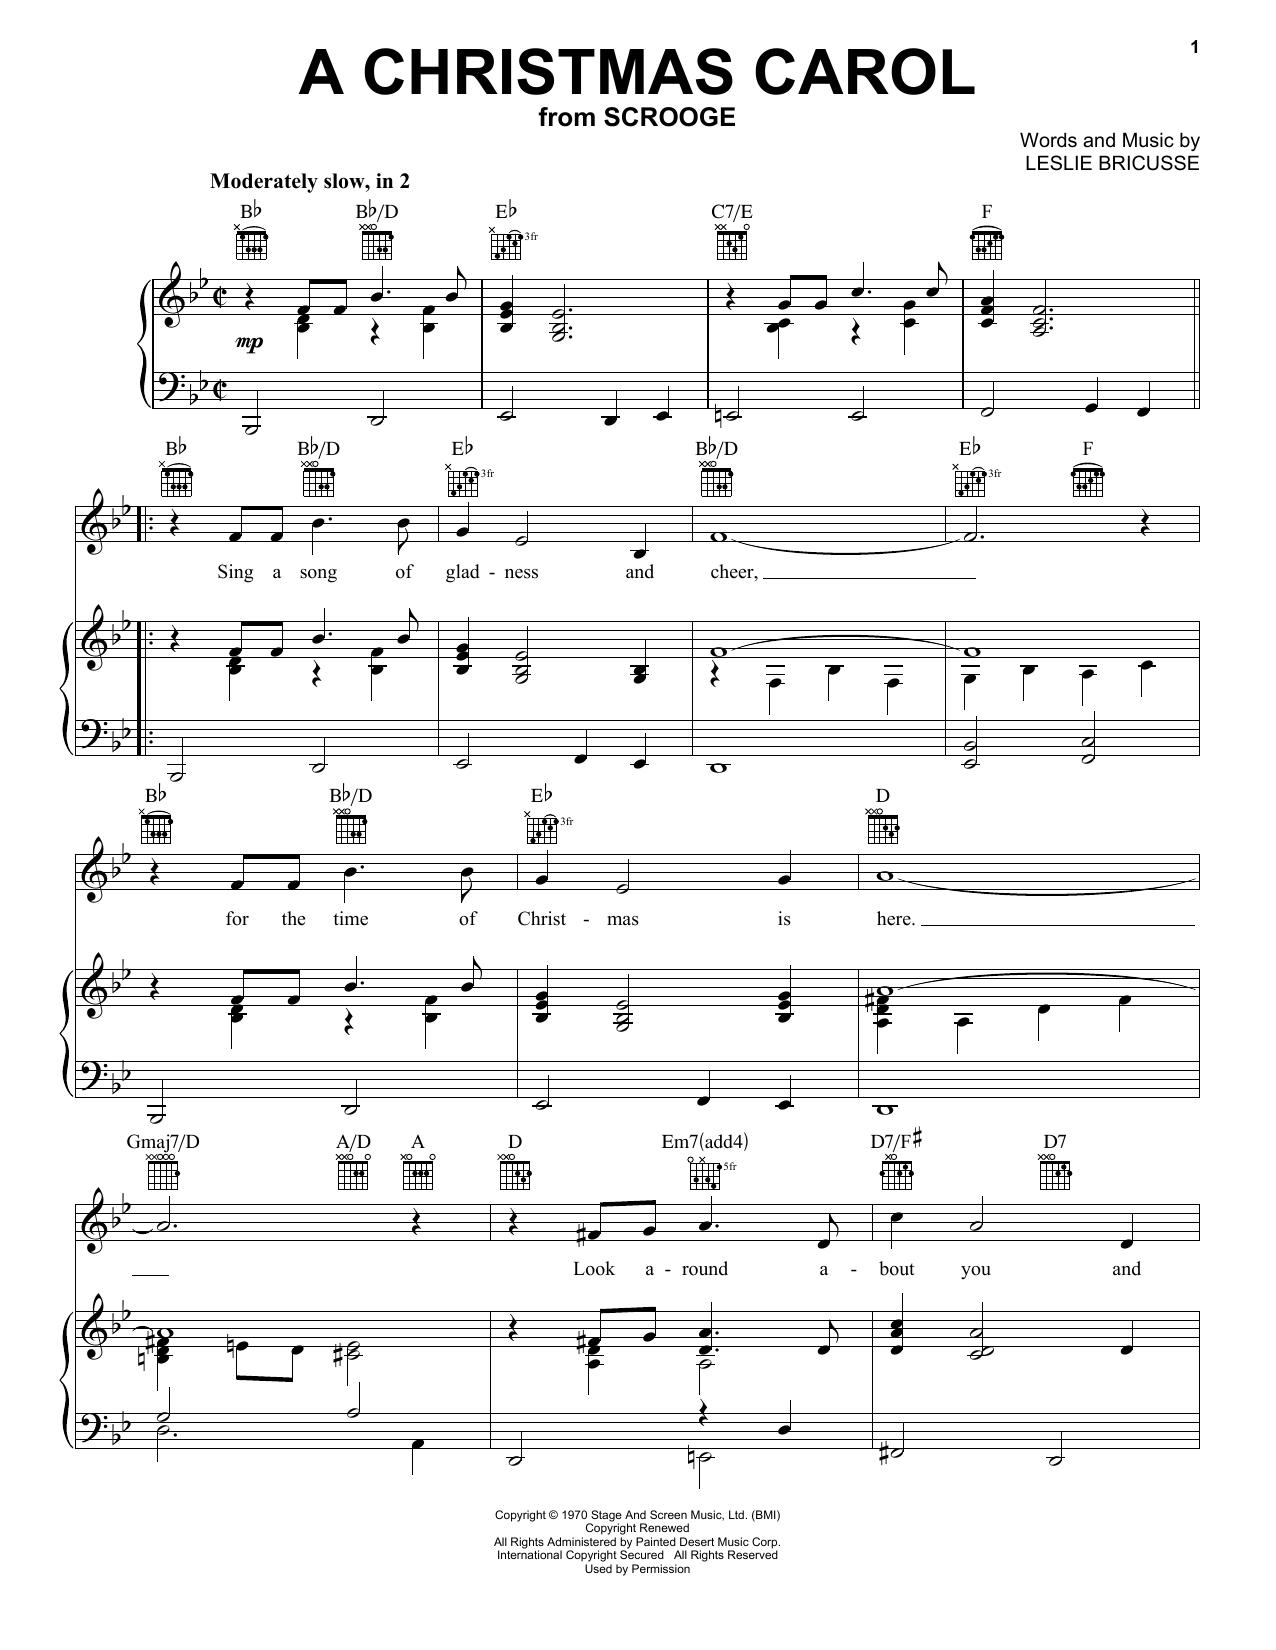 Leslie Bricusse 'a Christmas Carol' Sheet Music Notes, Chords | Download  Printable Piano, Vocal & Guitar (Right-Hand Melody) - Sku: 160834